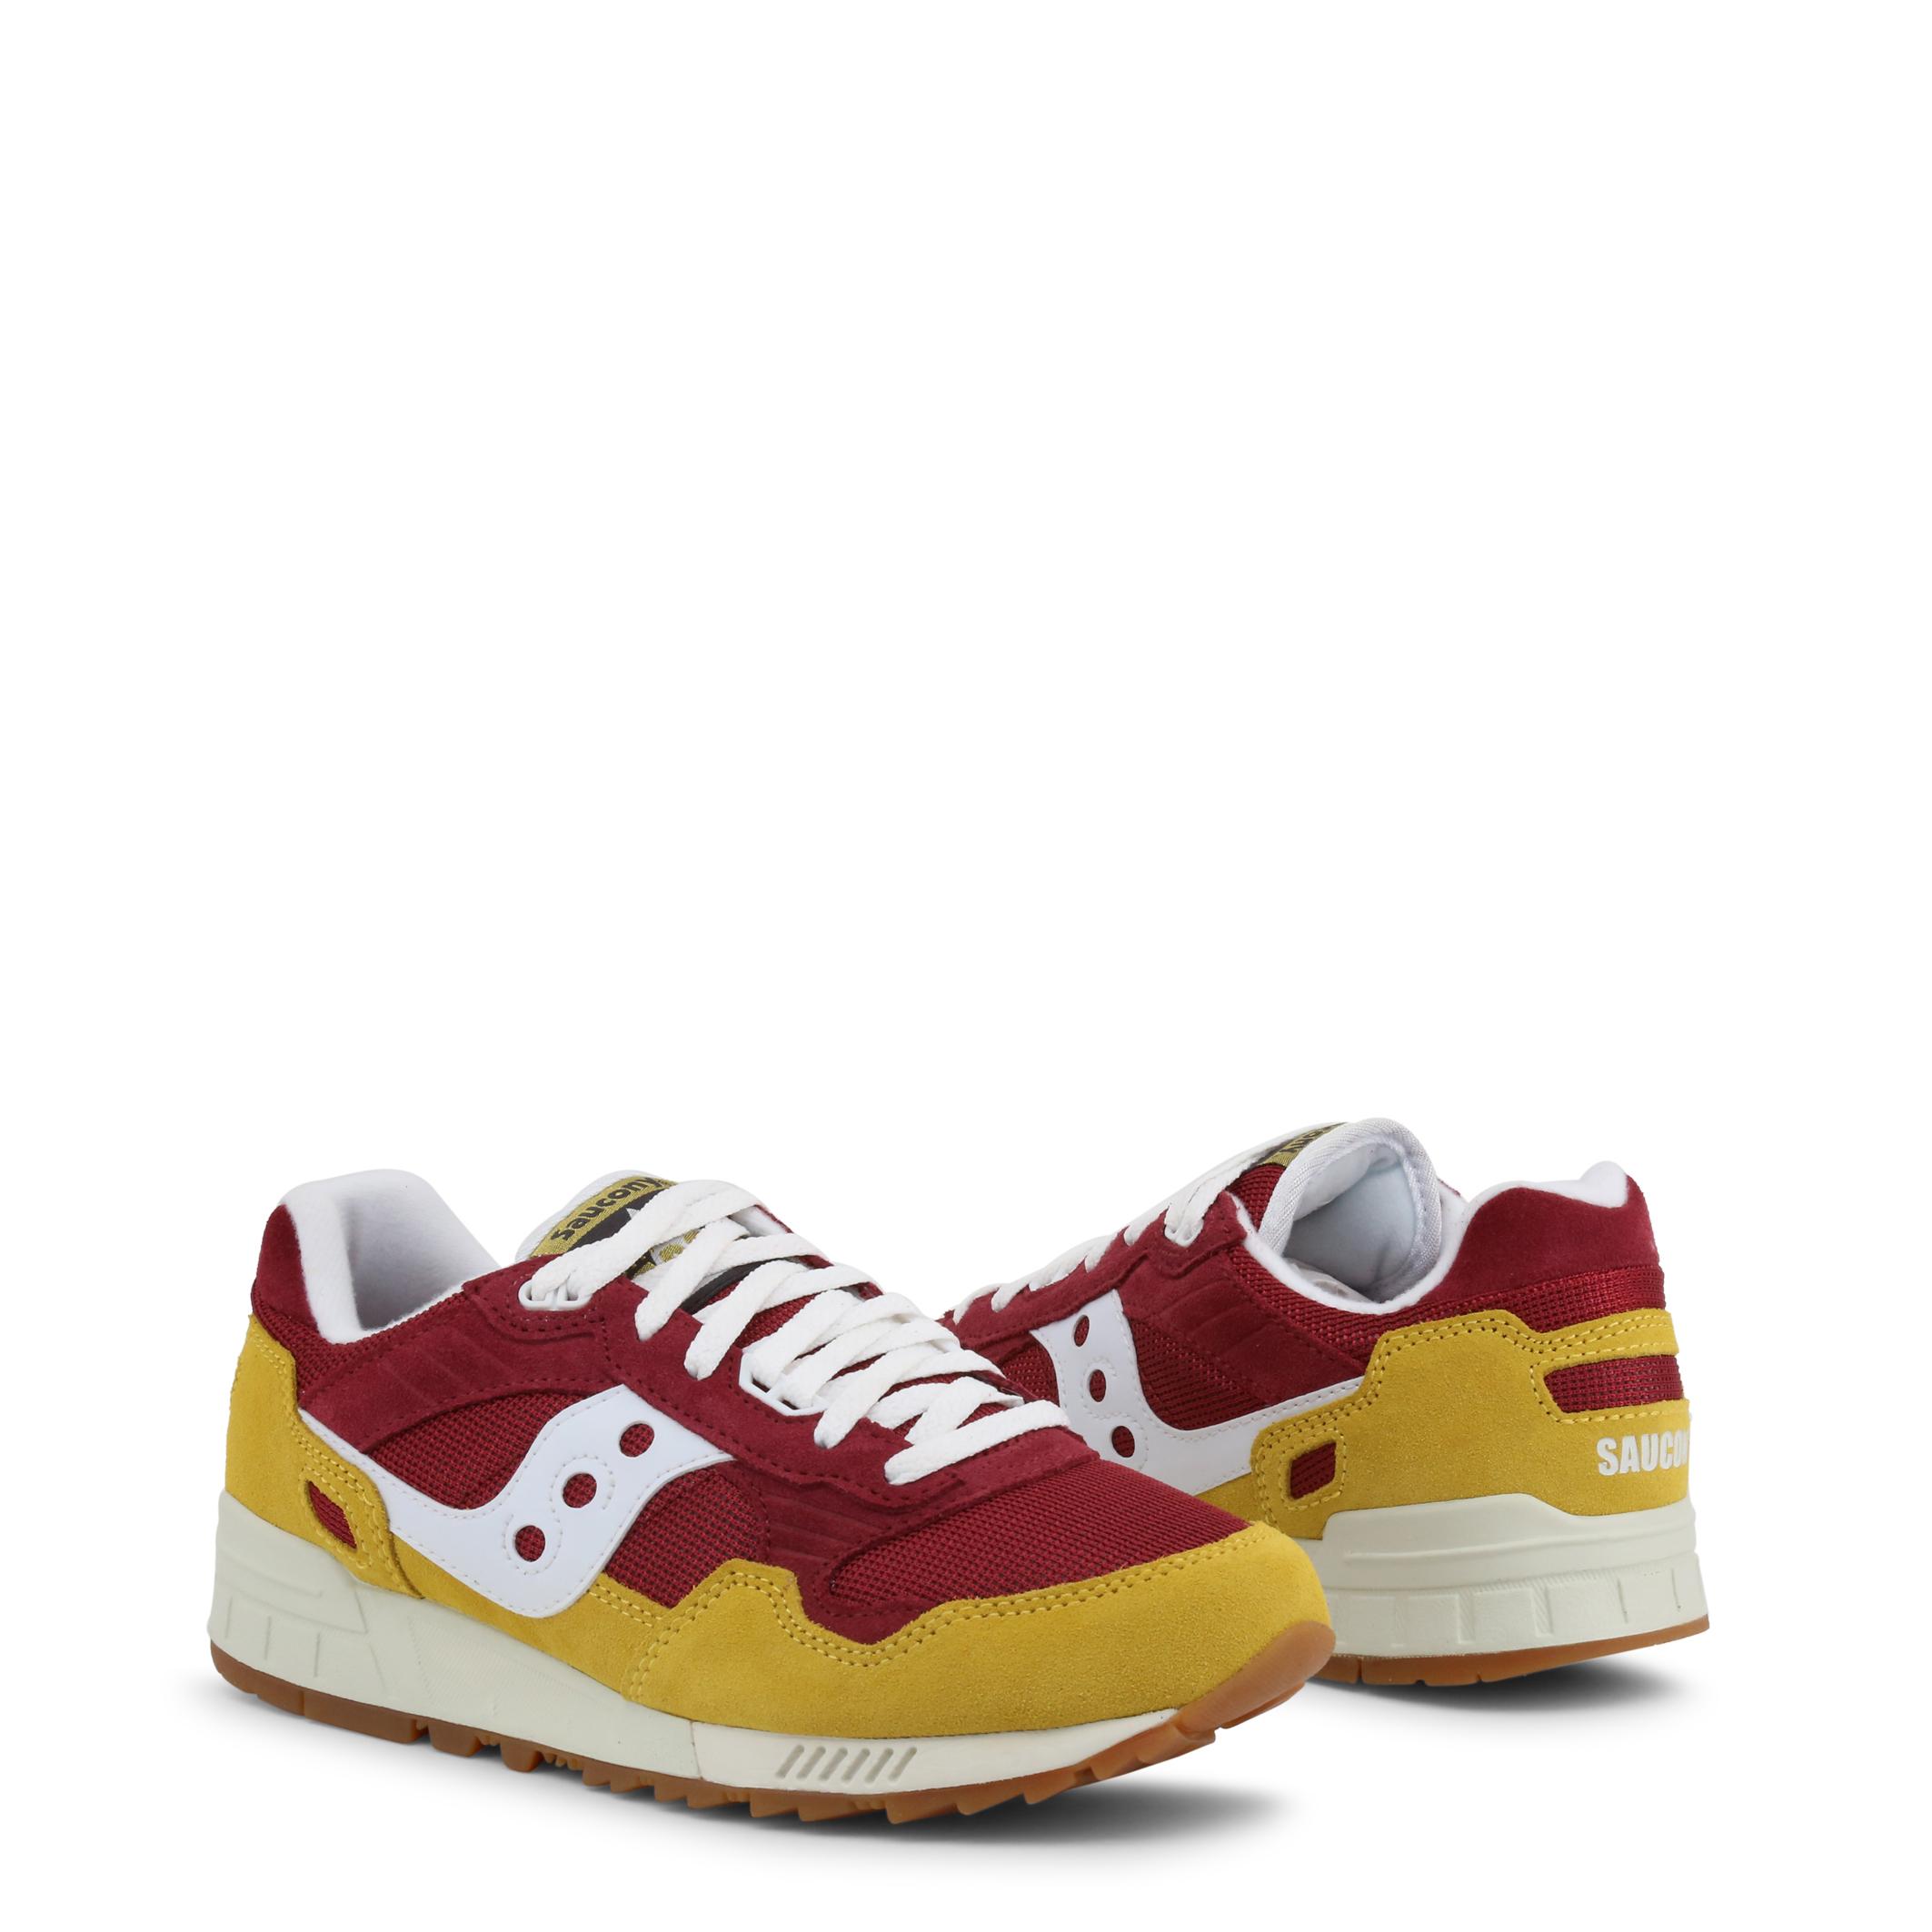 Sneakers-Saucony-SHADOW-5000-Uomo-Giallo-102543 miniatura 2